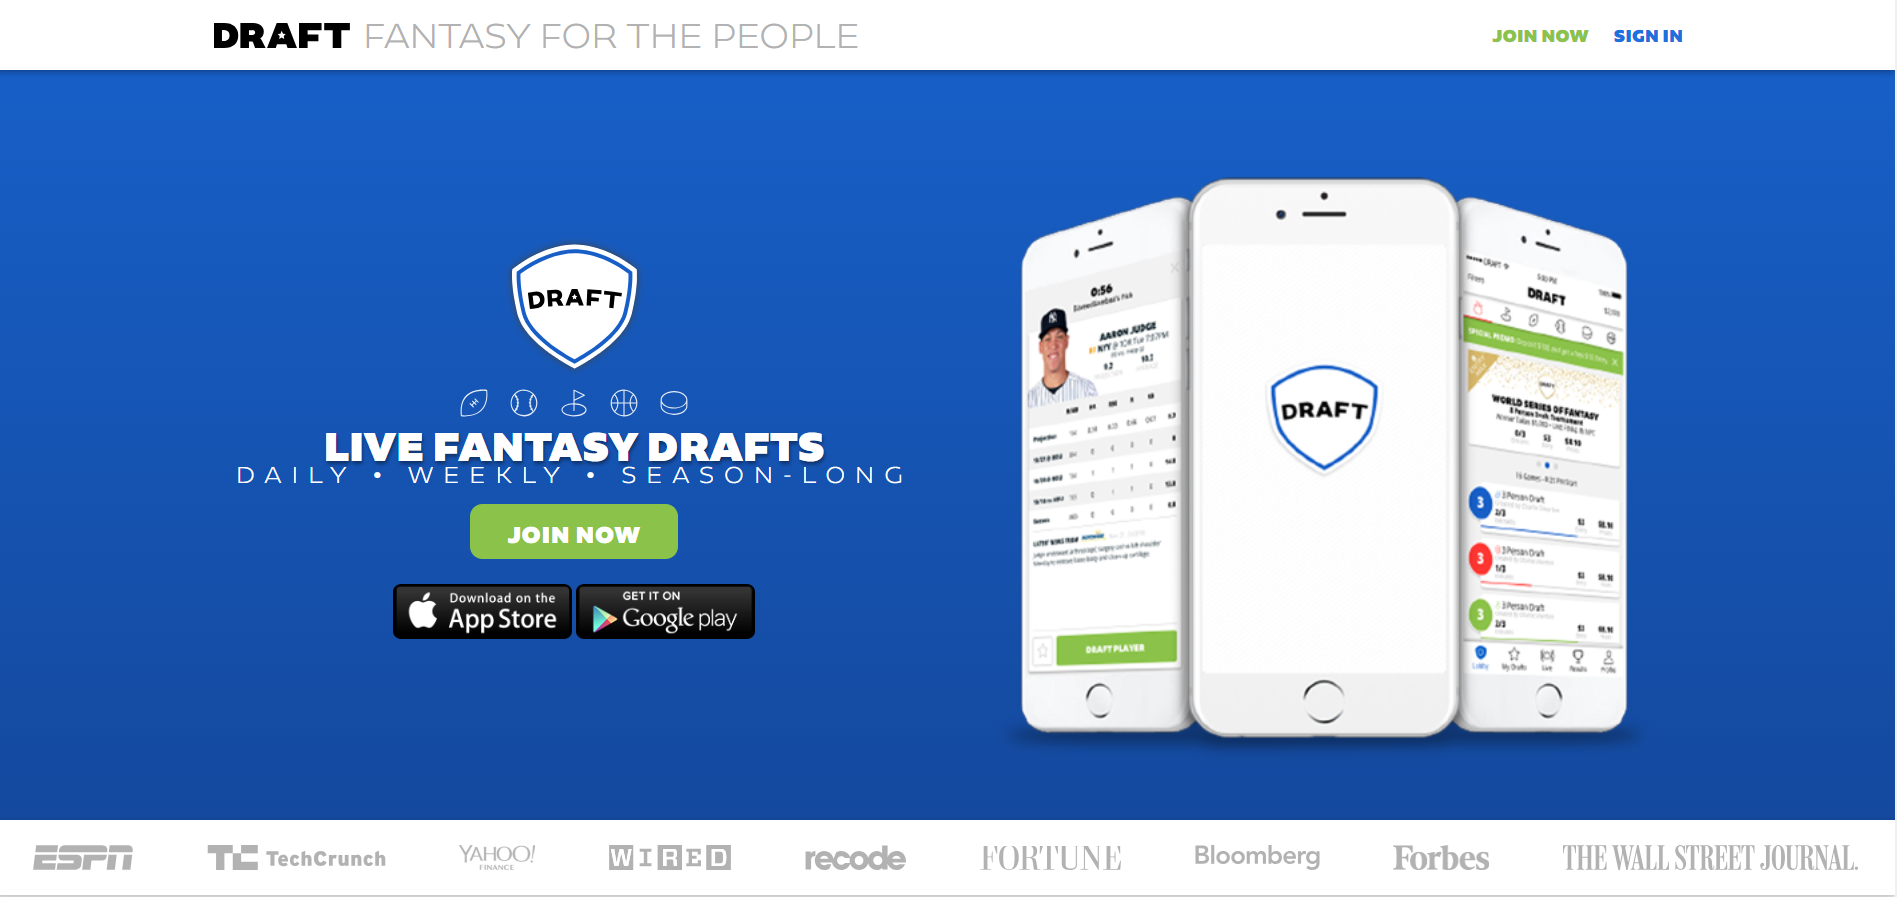 DRAFT Review - Draft com - Best Signup Bonus